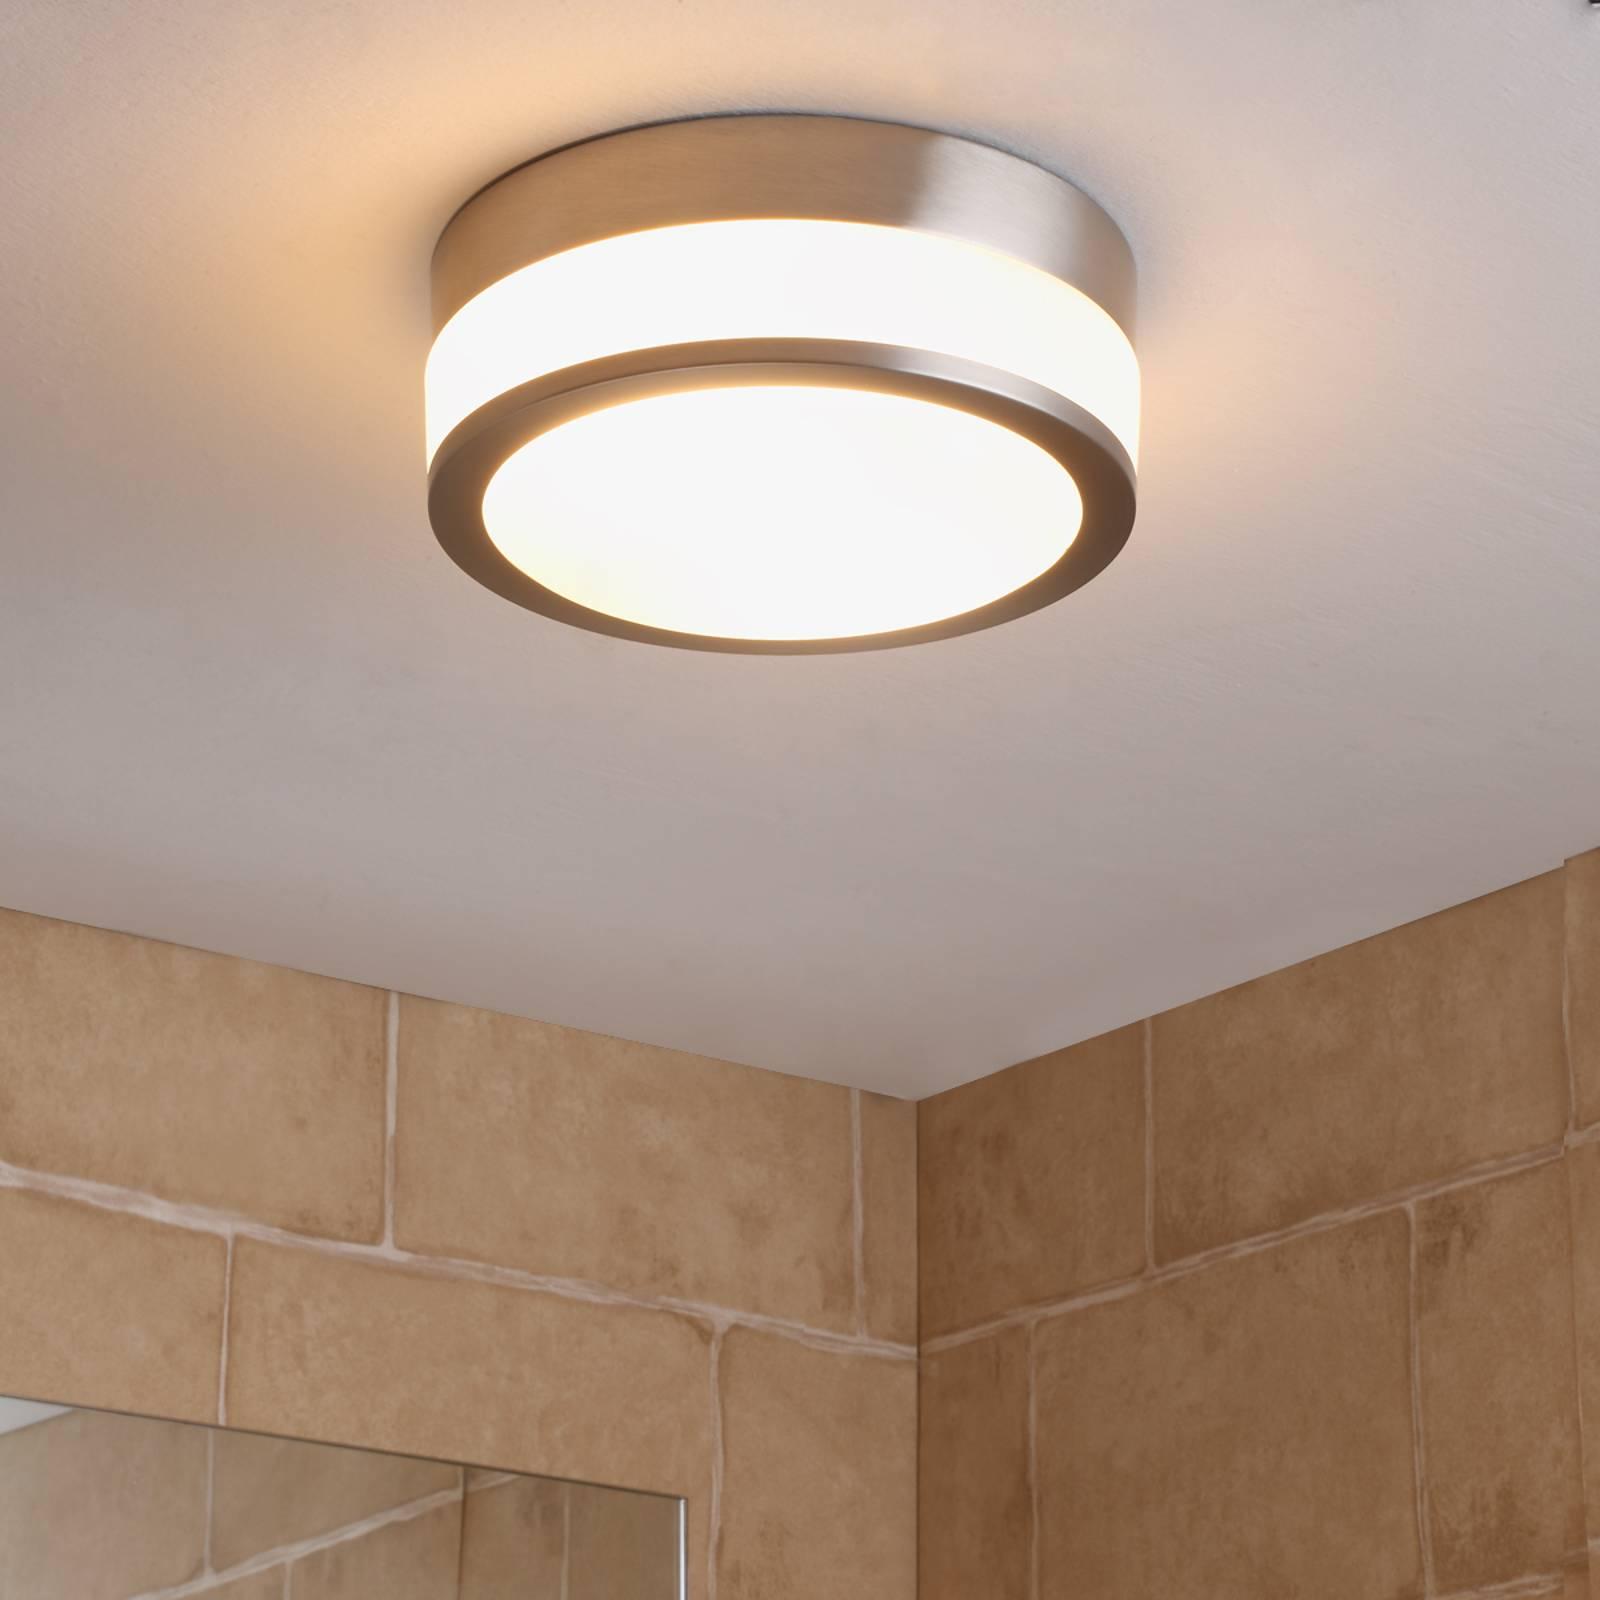 Badkamer-plafondlamp Flavi, mat nikkel